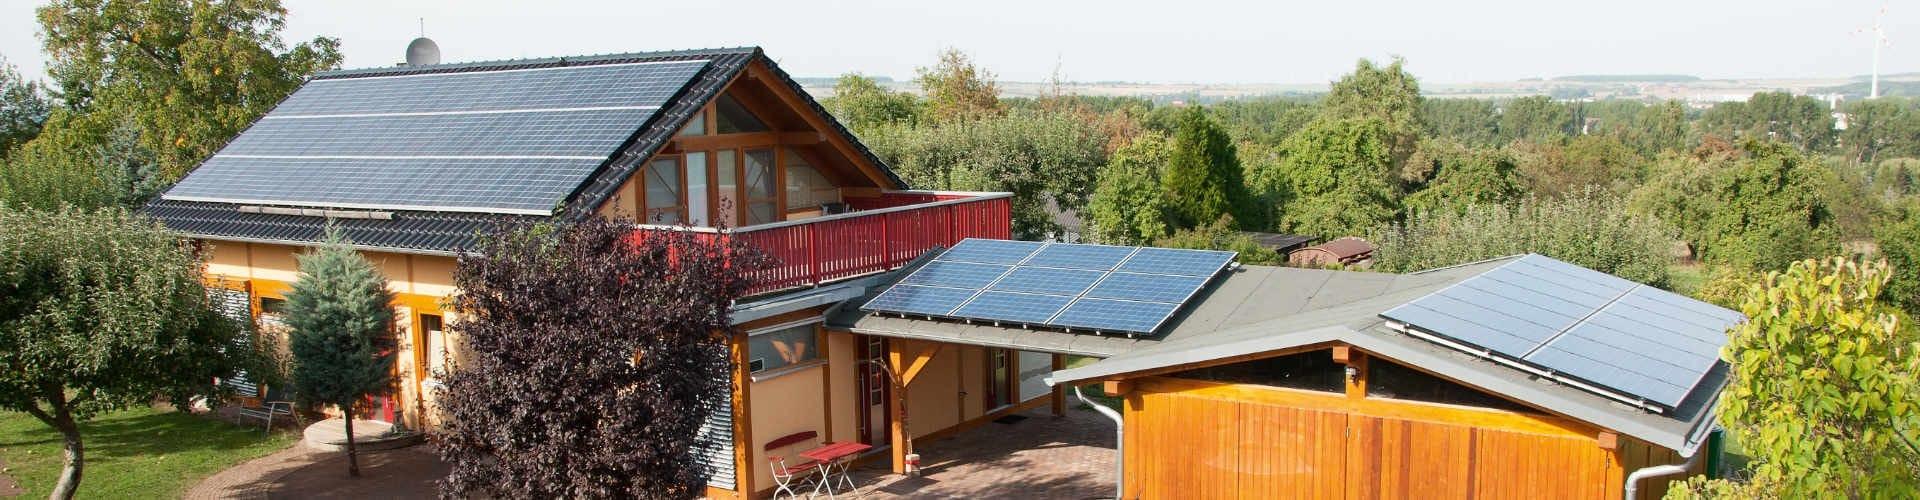 maxx solar - Photovoltaik Thüringen